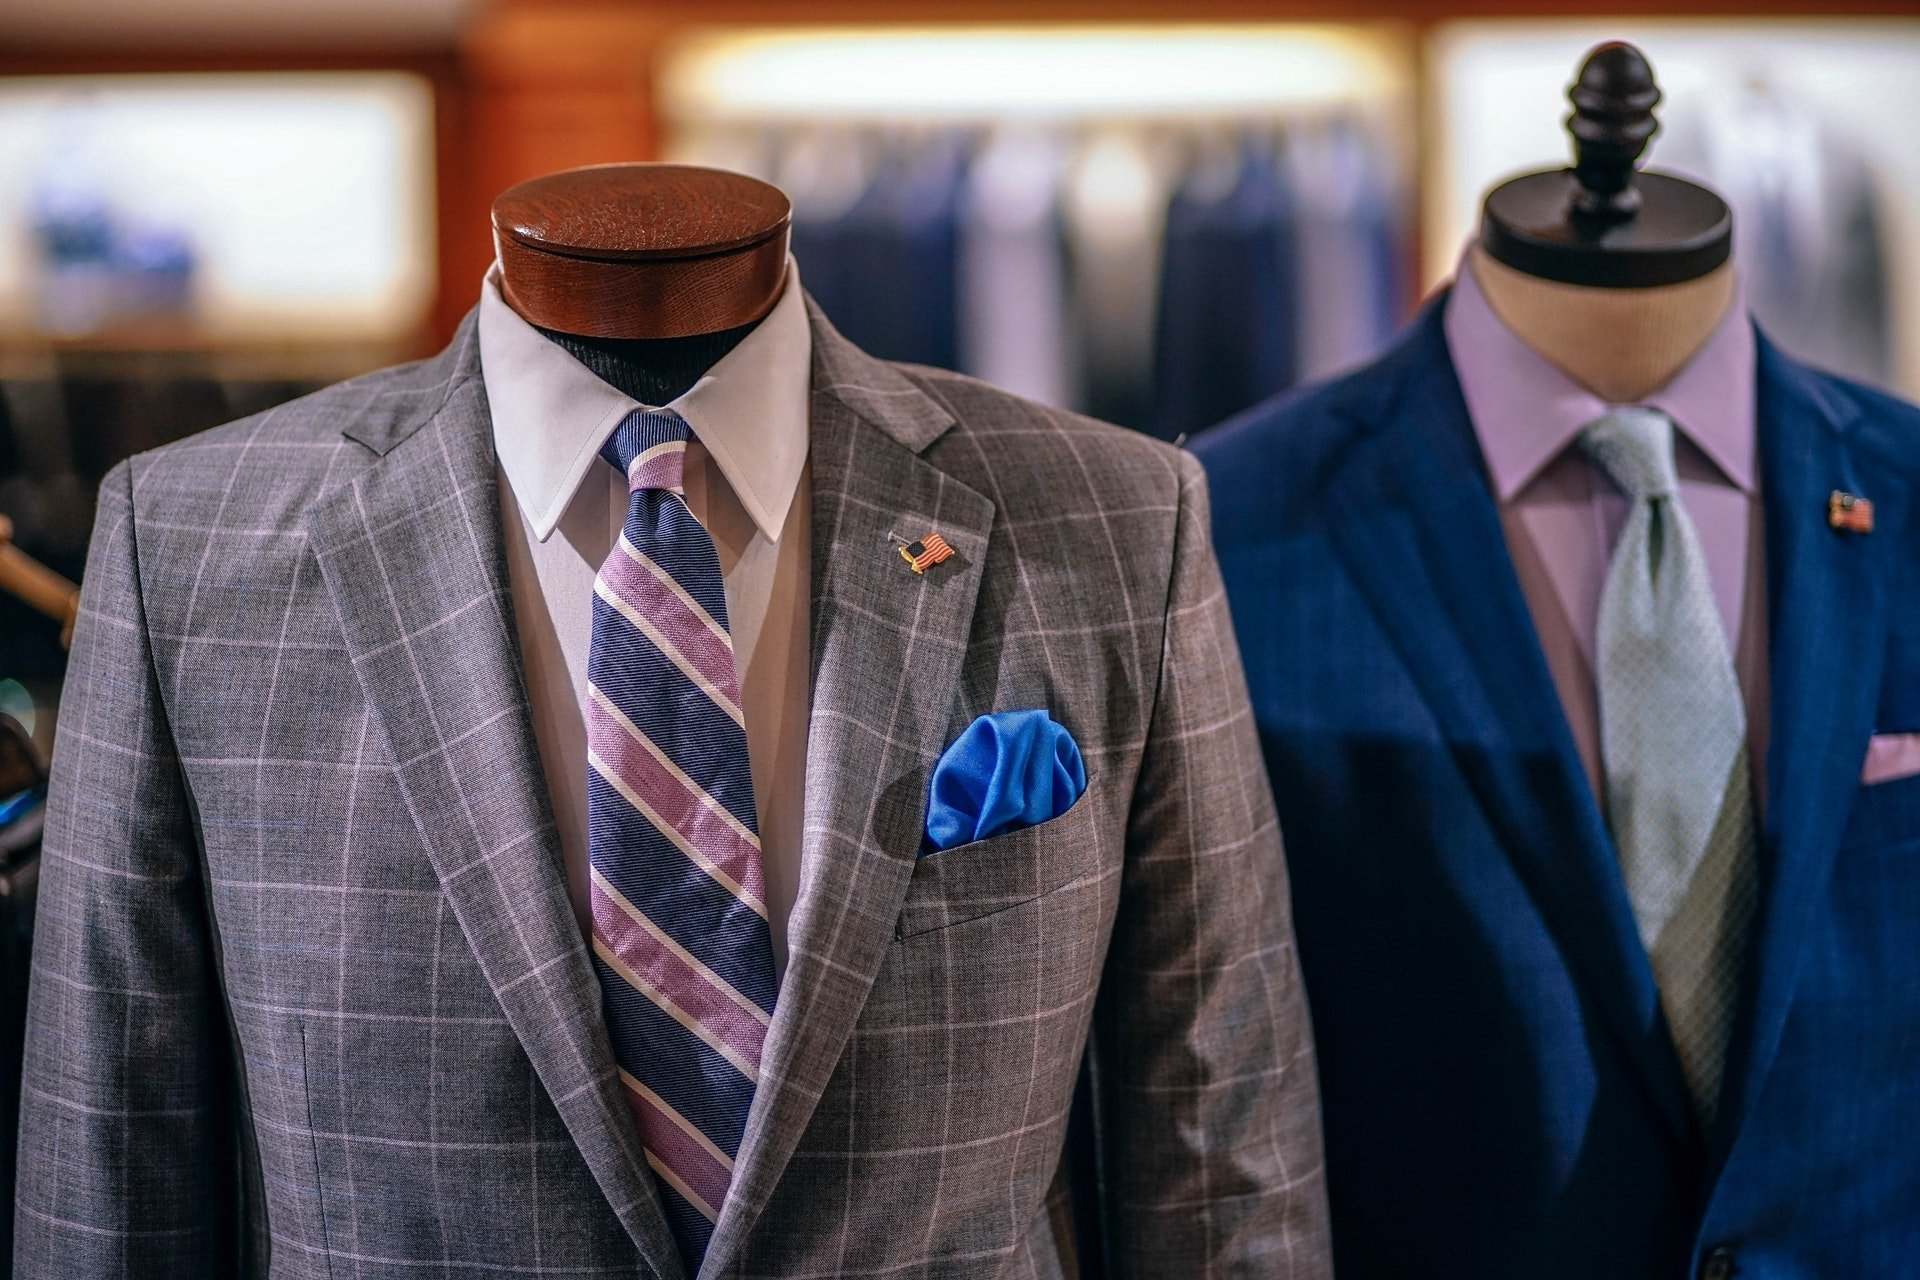 mens suits on mannequins